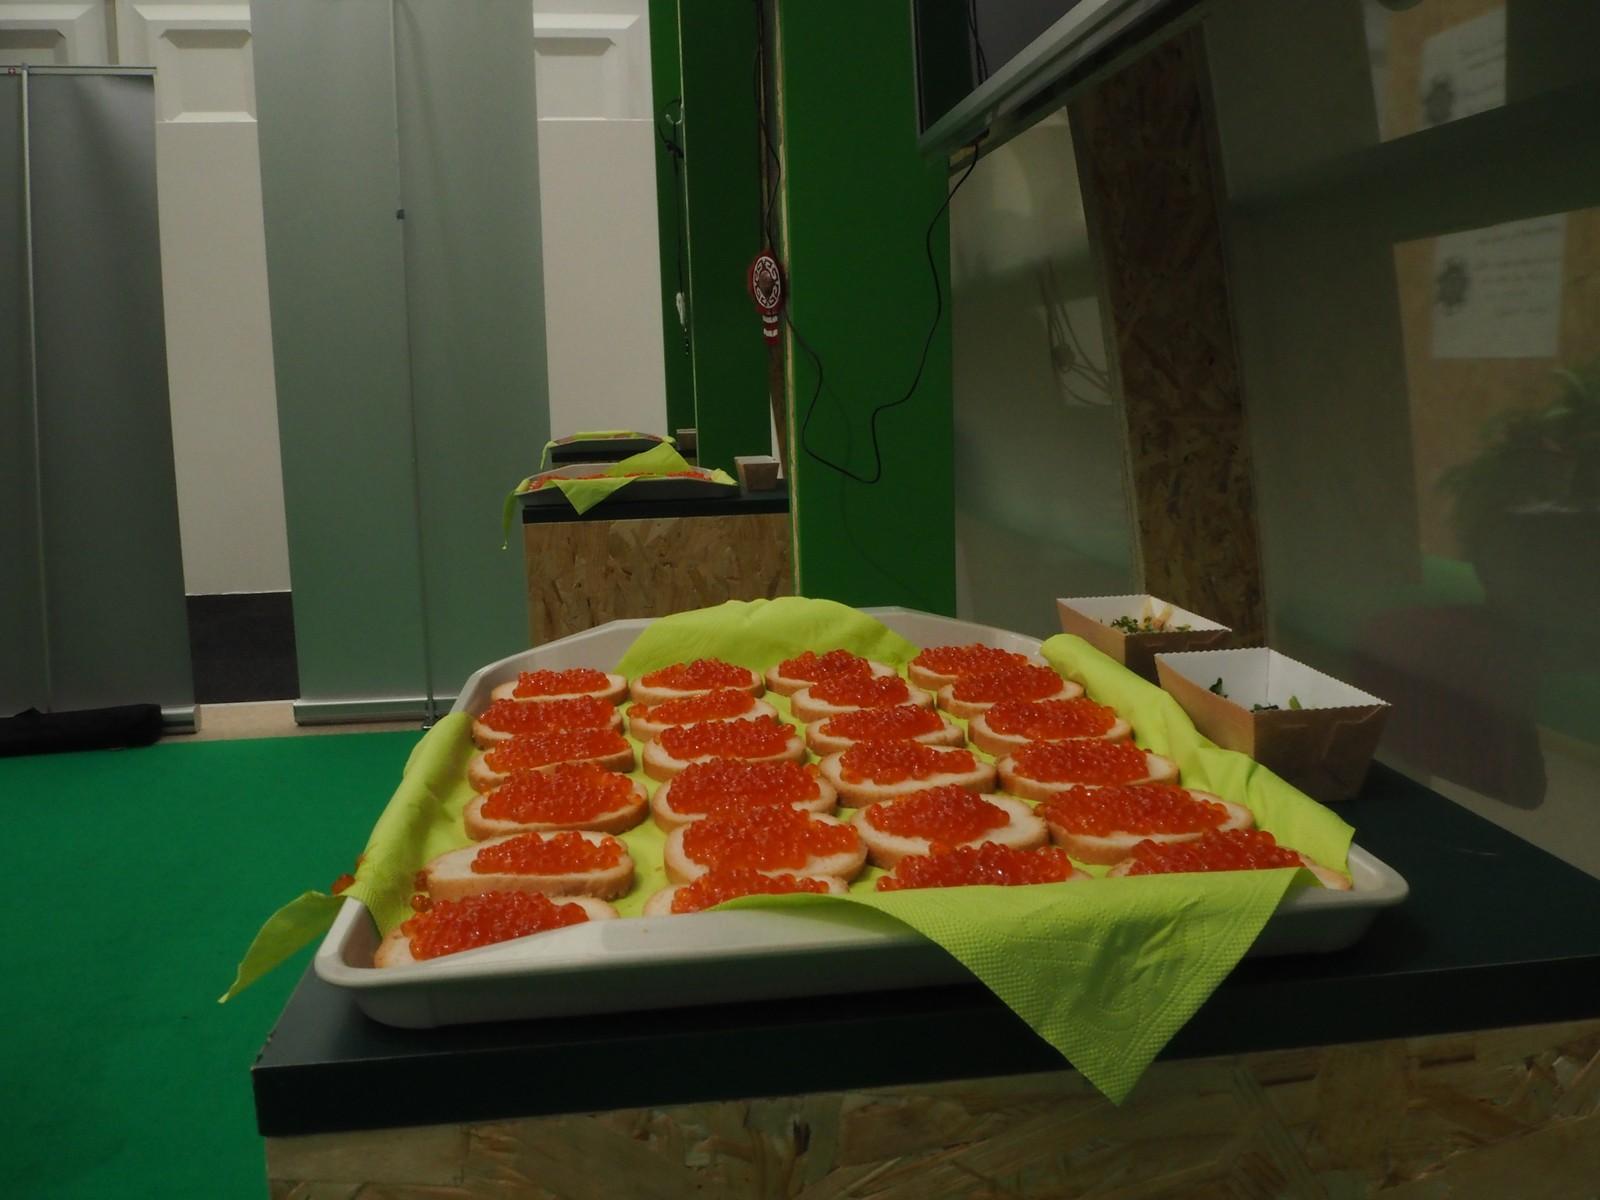 Russisk kaviar under dagen for russiske urfolk.